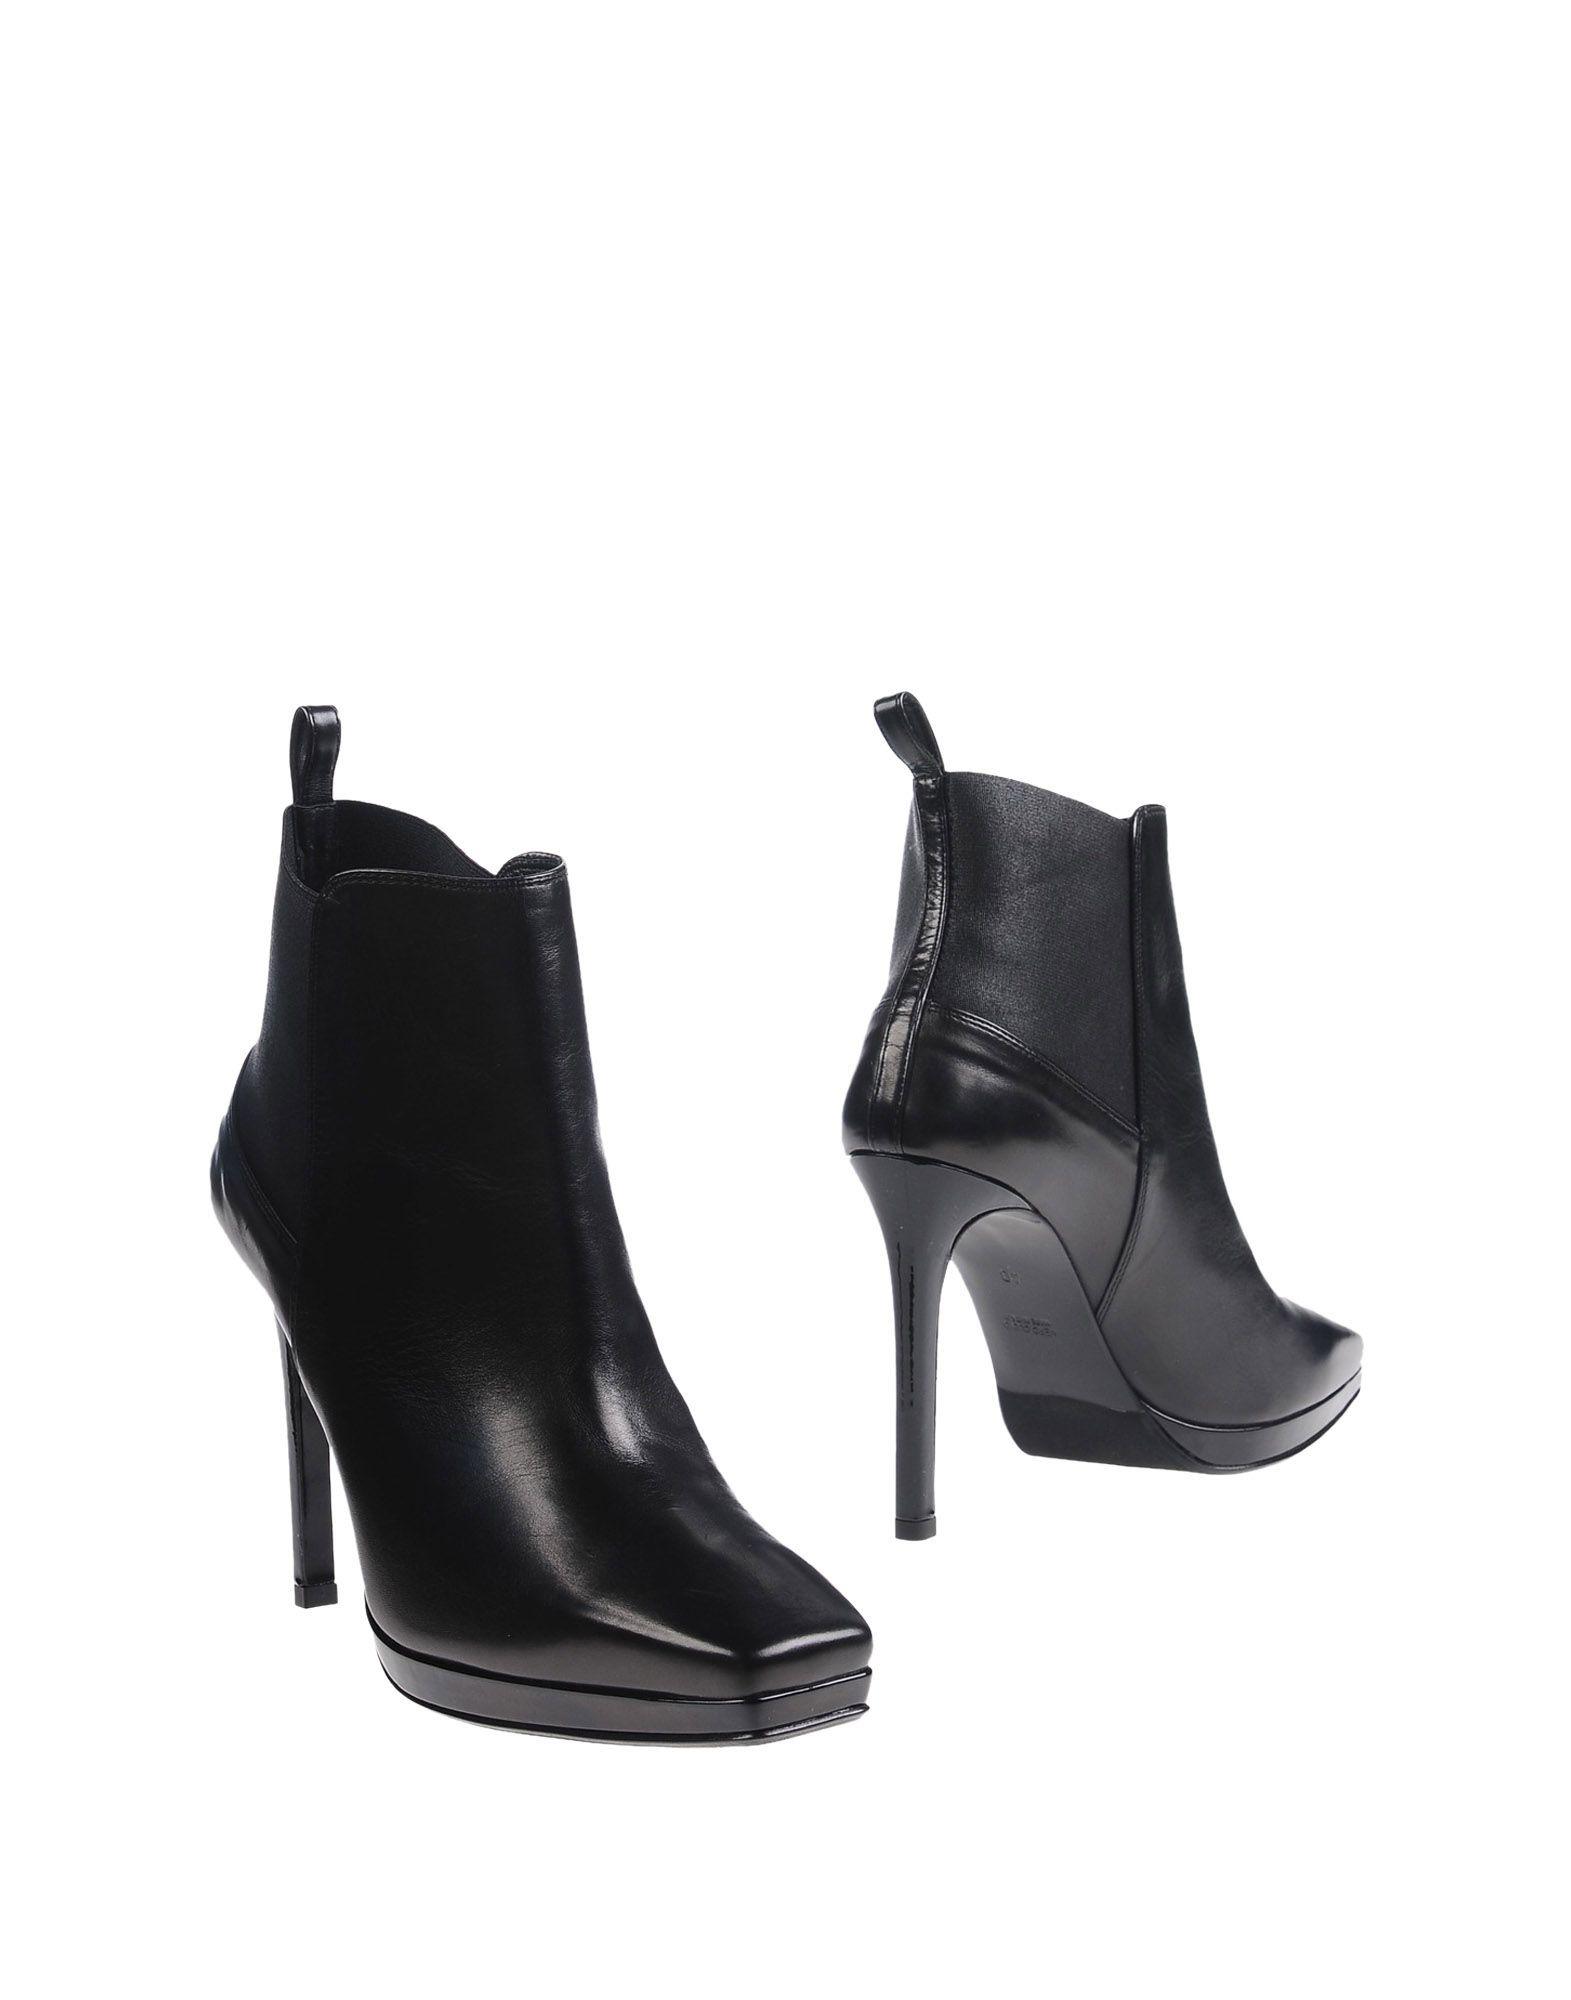 FABI Полусапоги и высокие ботинки jeannot полусапоги и высокие ботинки